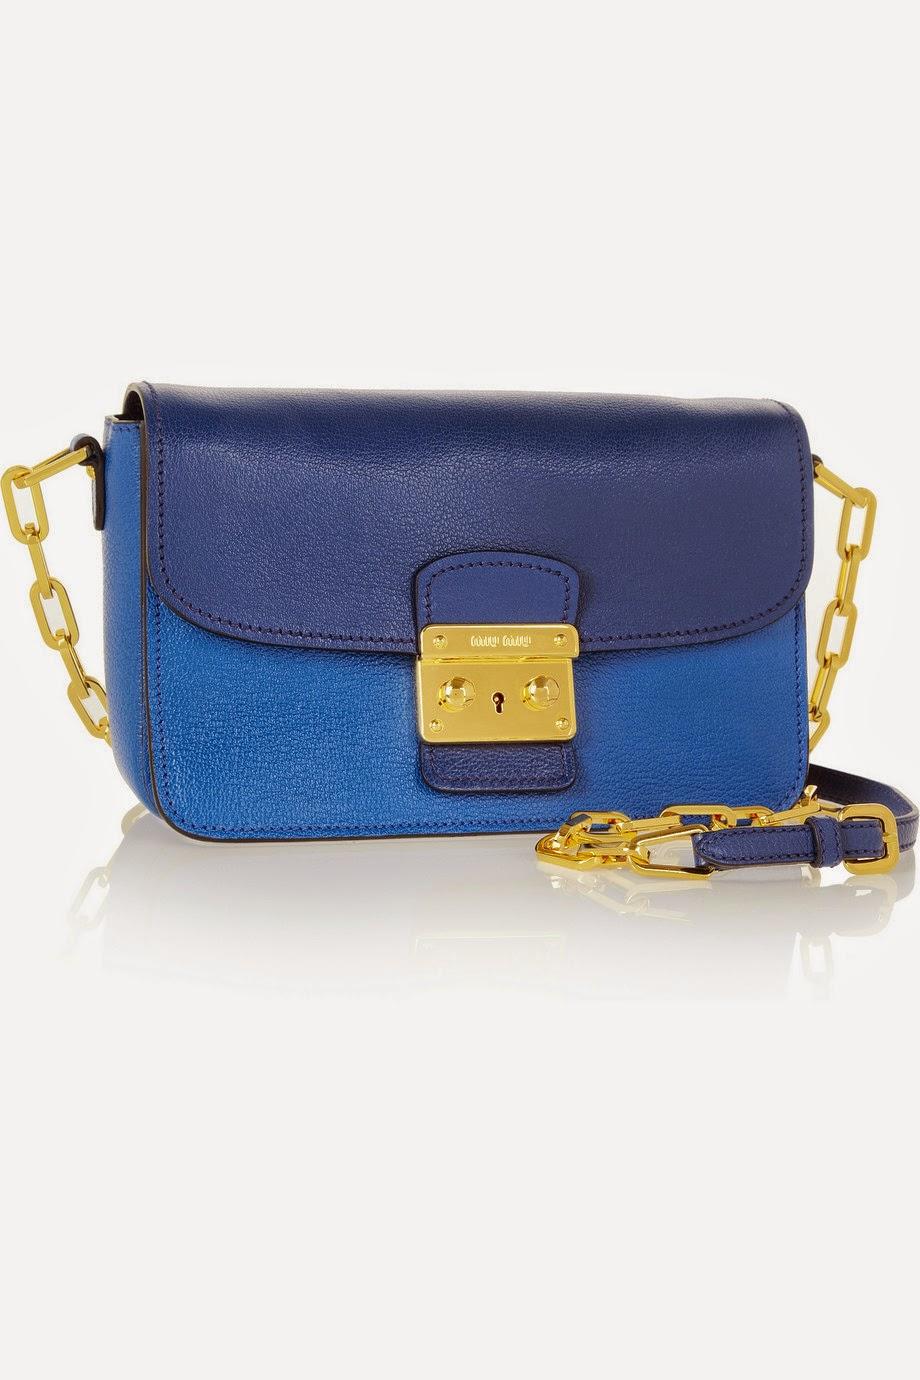 Net-a-Porter Miu Miu Bandoliera Madras two-tone leather shoulder bag